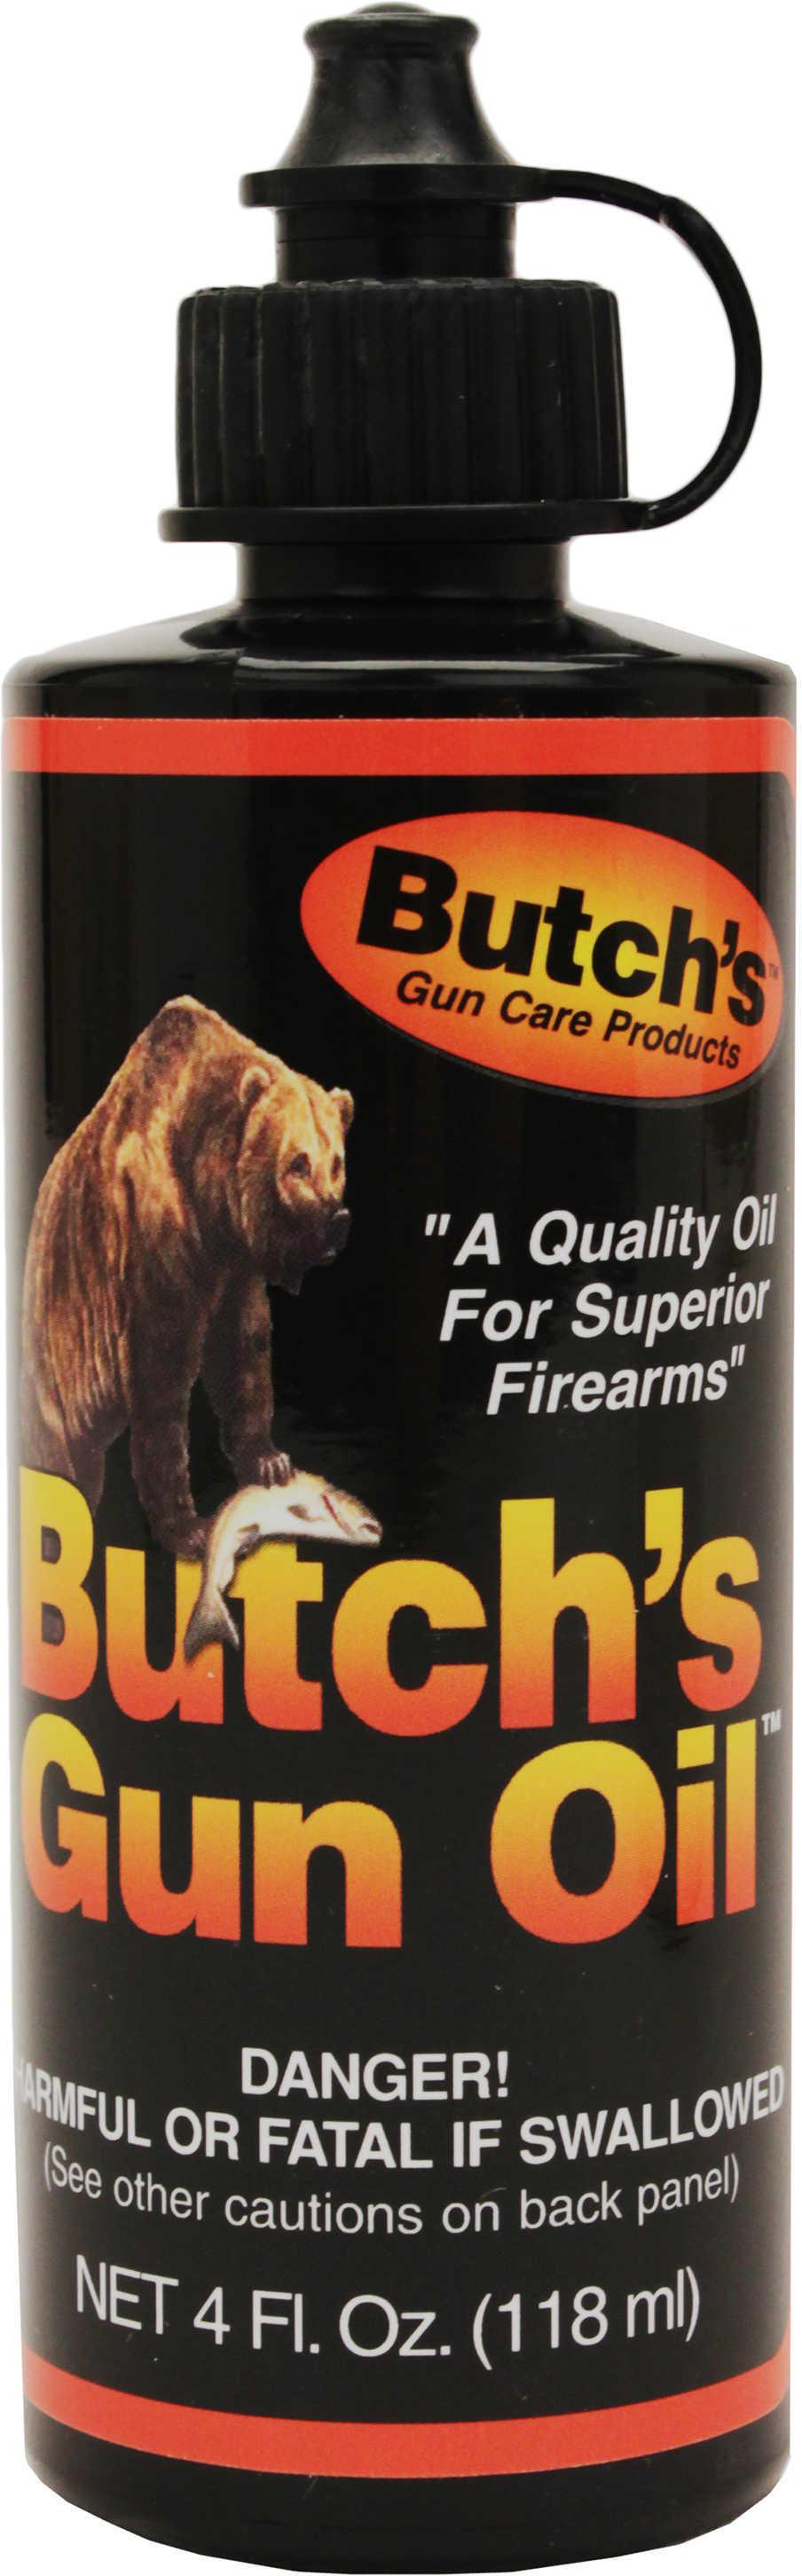 Lyman Butch's Gun Oil Md: 02948